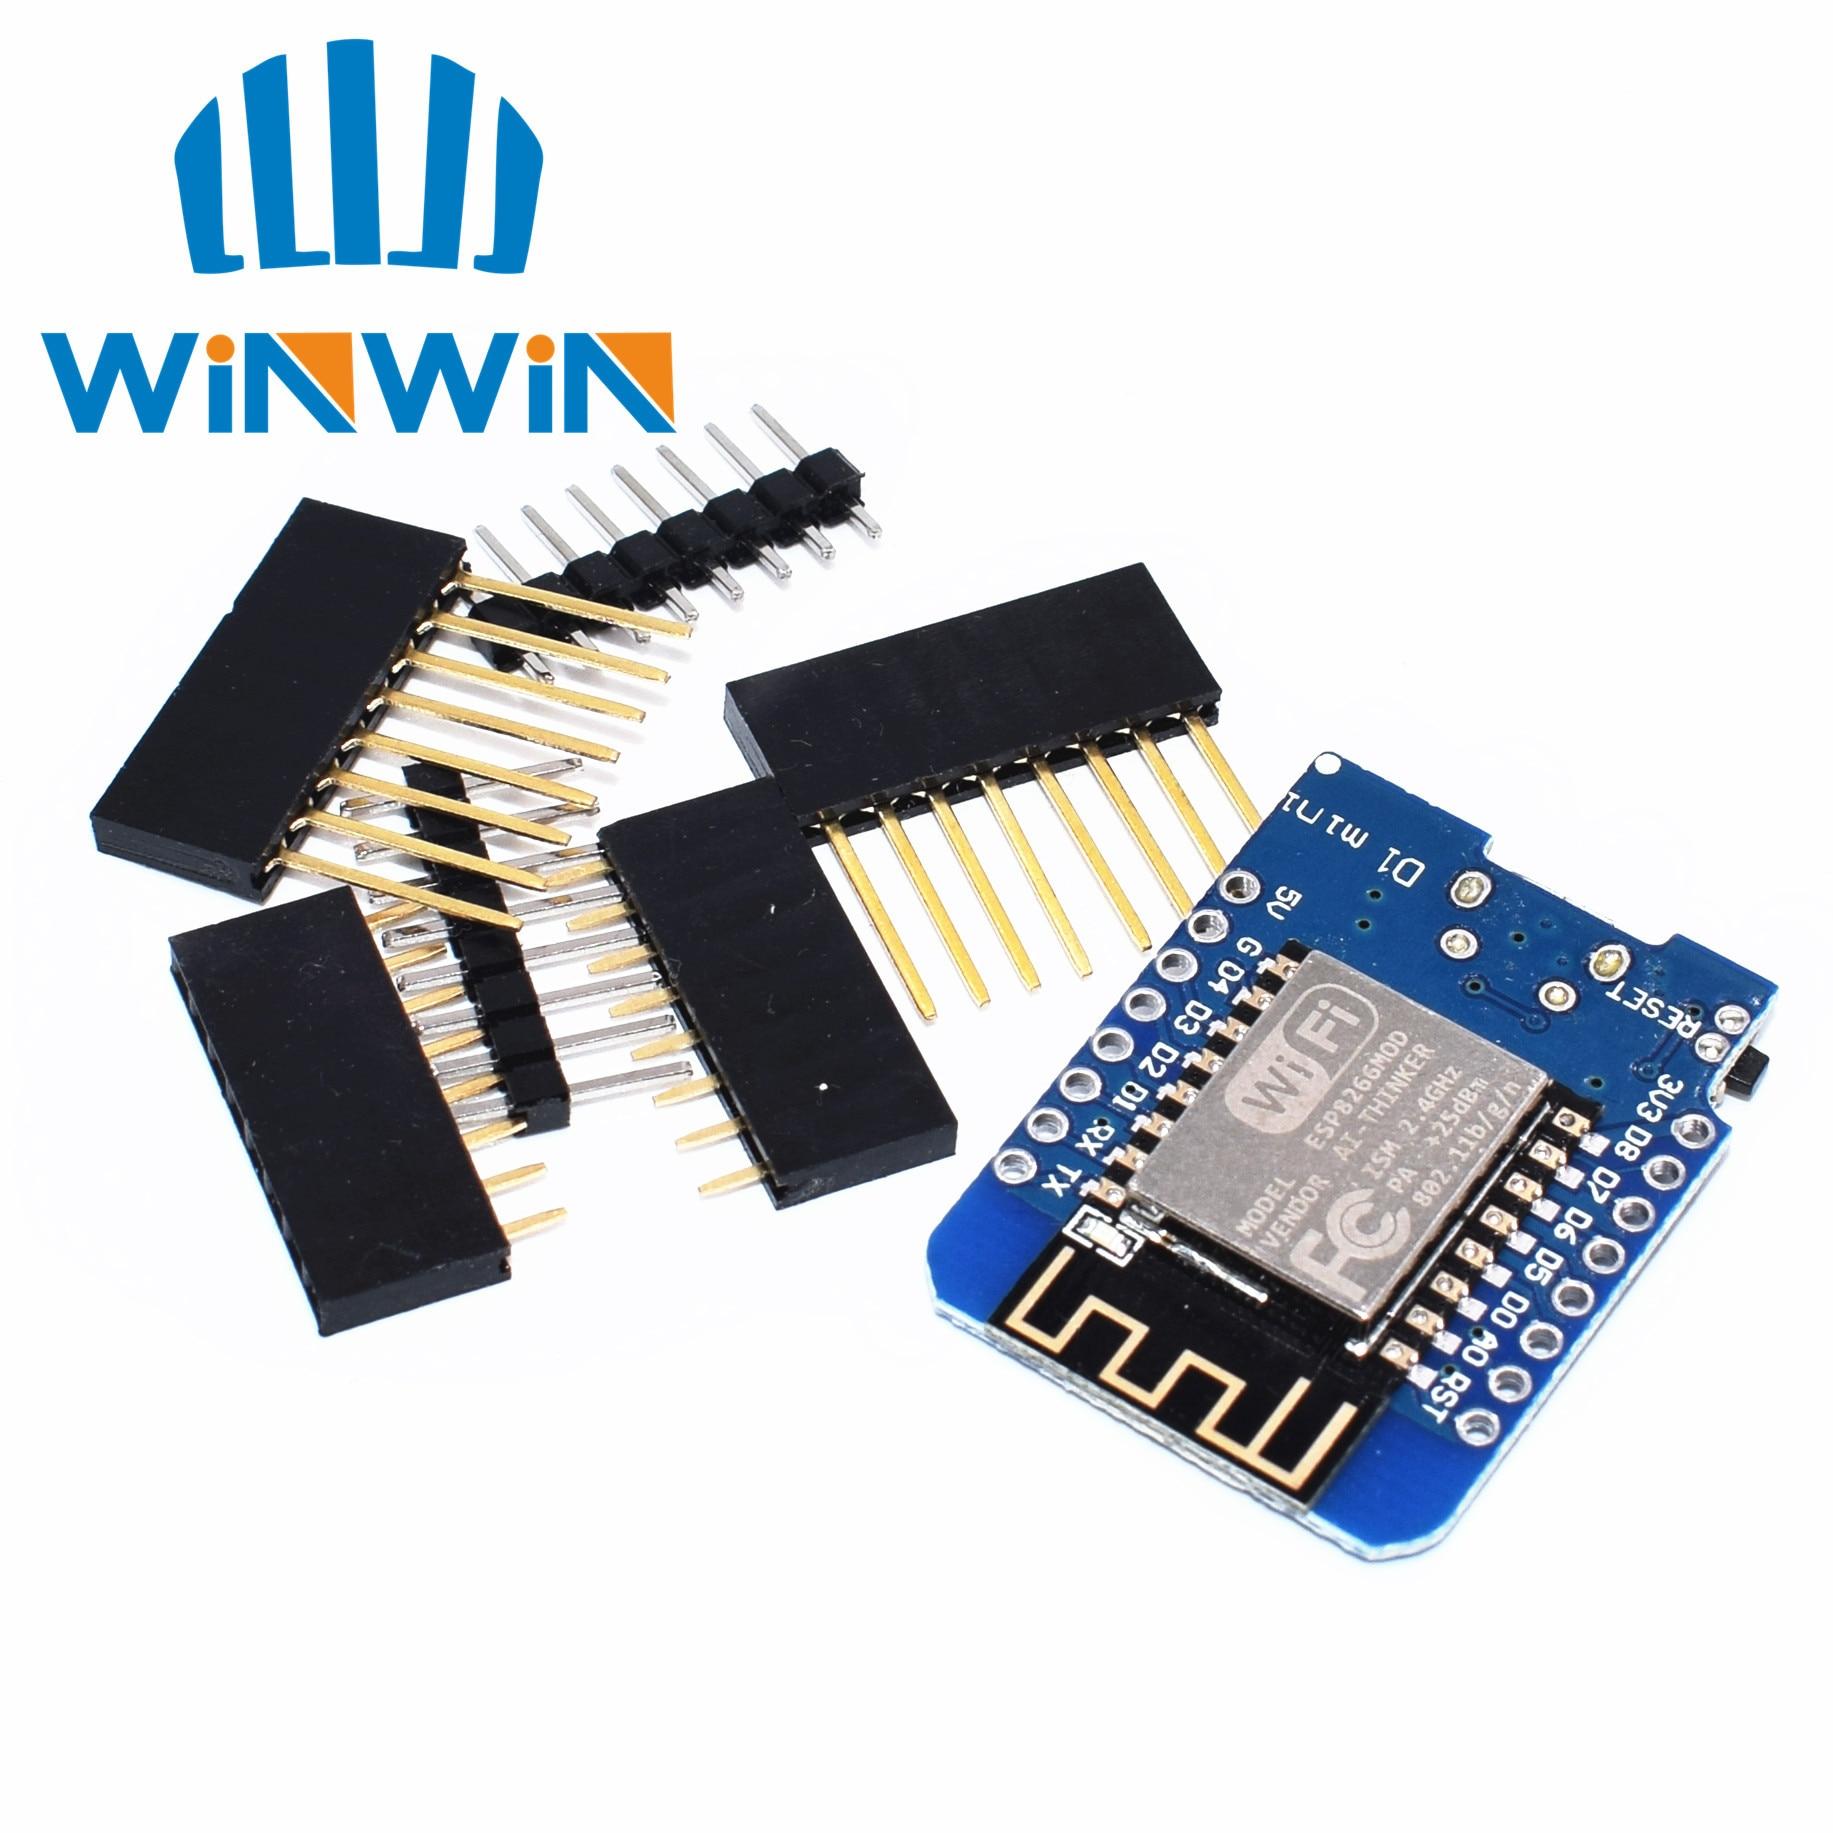 D1 mini - Mini NodeMcu 4M bytes Lua WIFI Internet of Things development board based ESP8266 WeMos